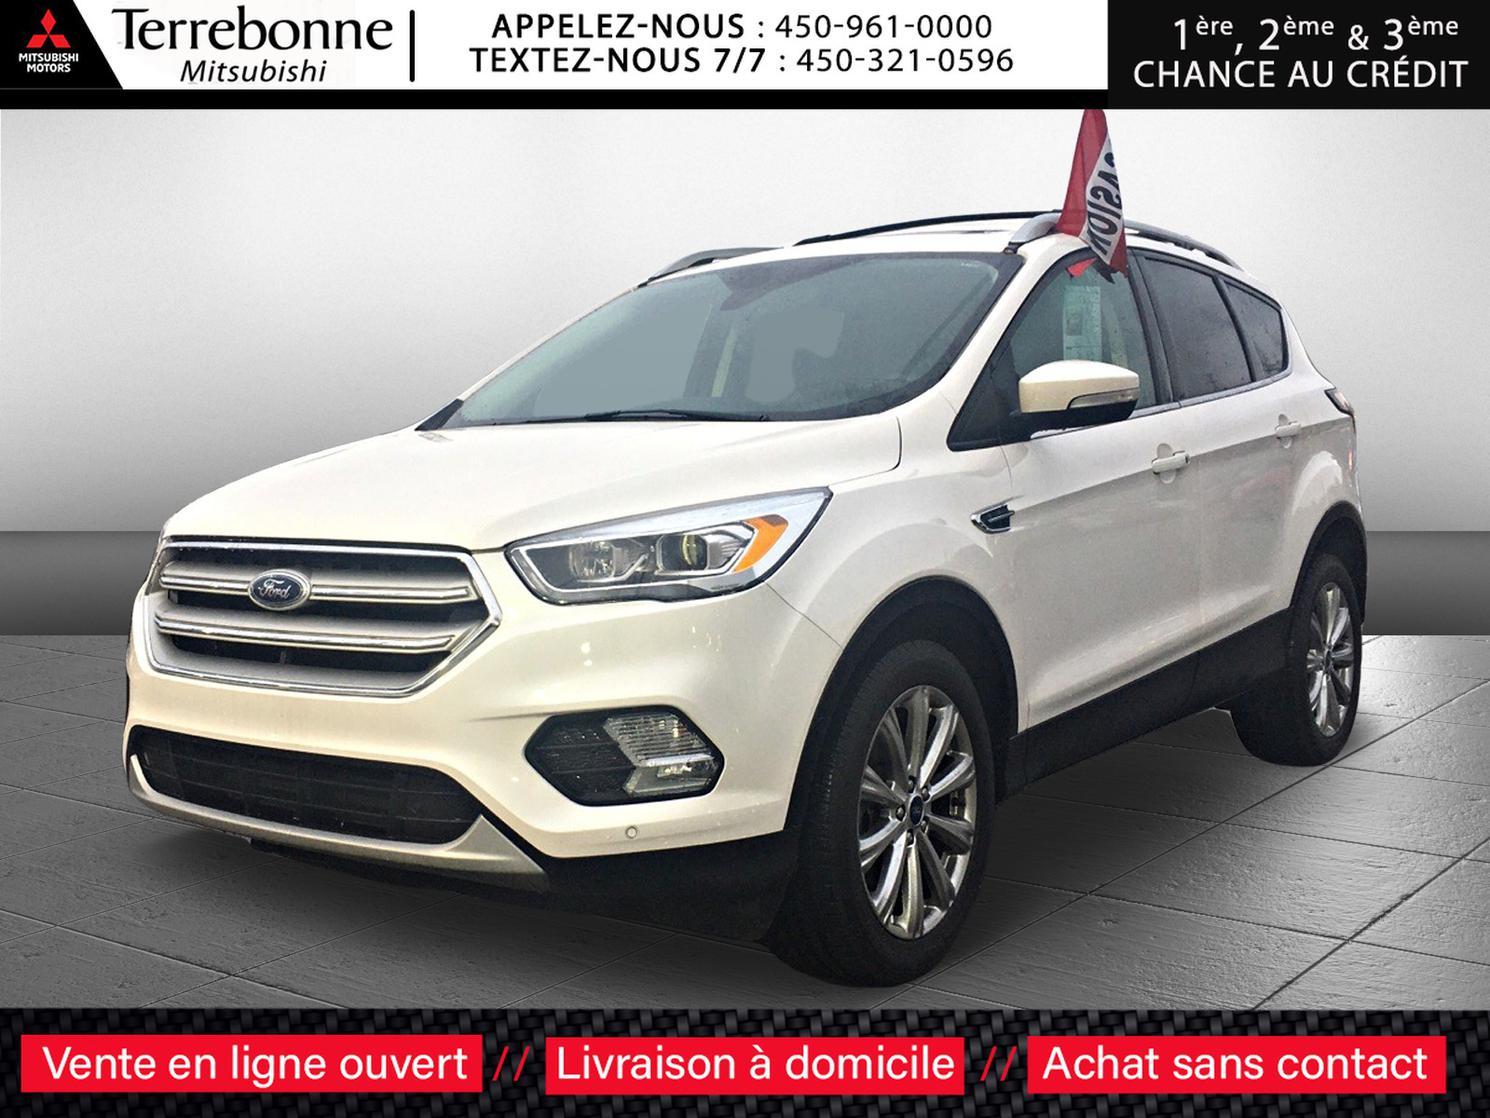 2018 Ford Escape TITANIUM**4X4**2.0TURBO**CUIR/GPS/TOIT OUVRANT**